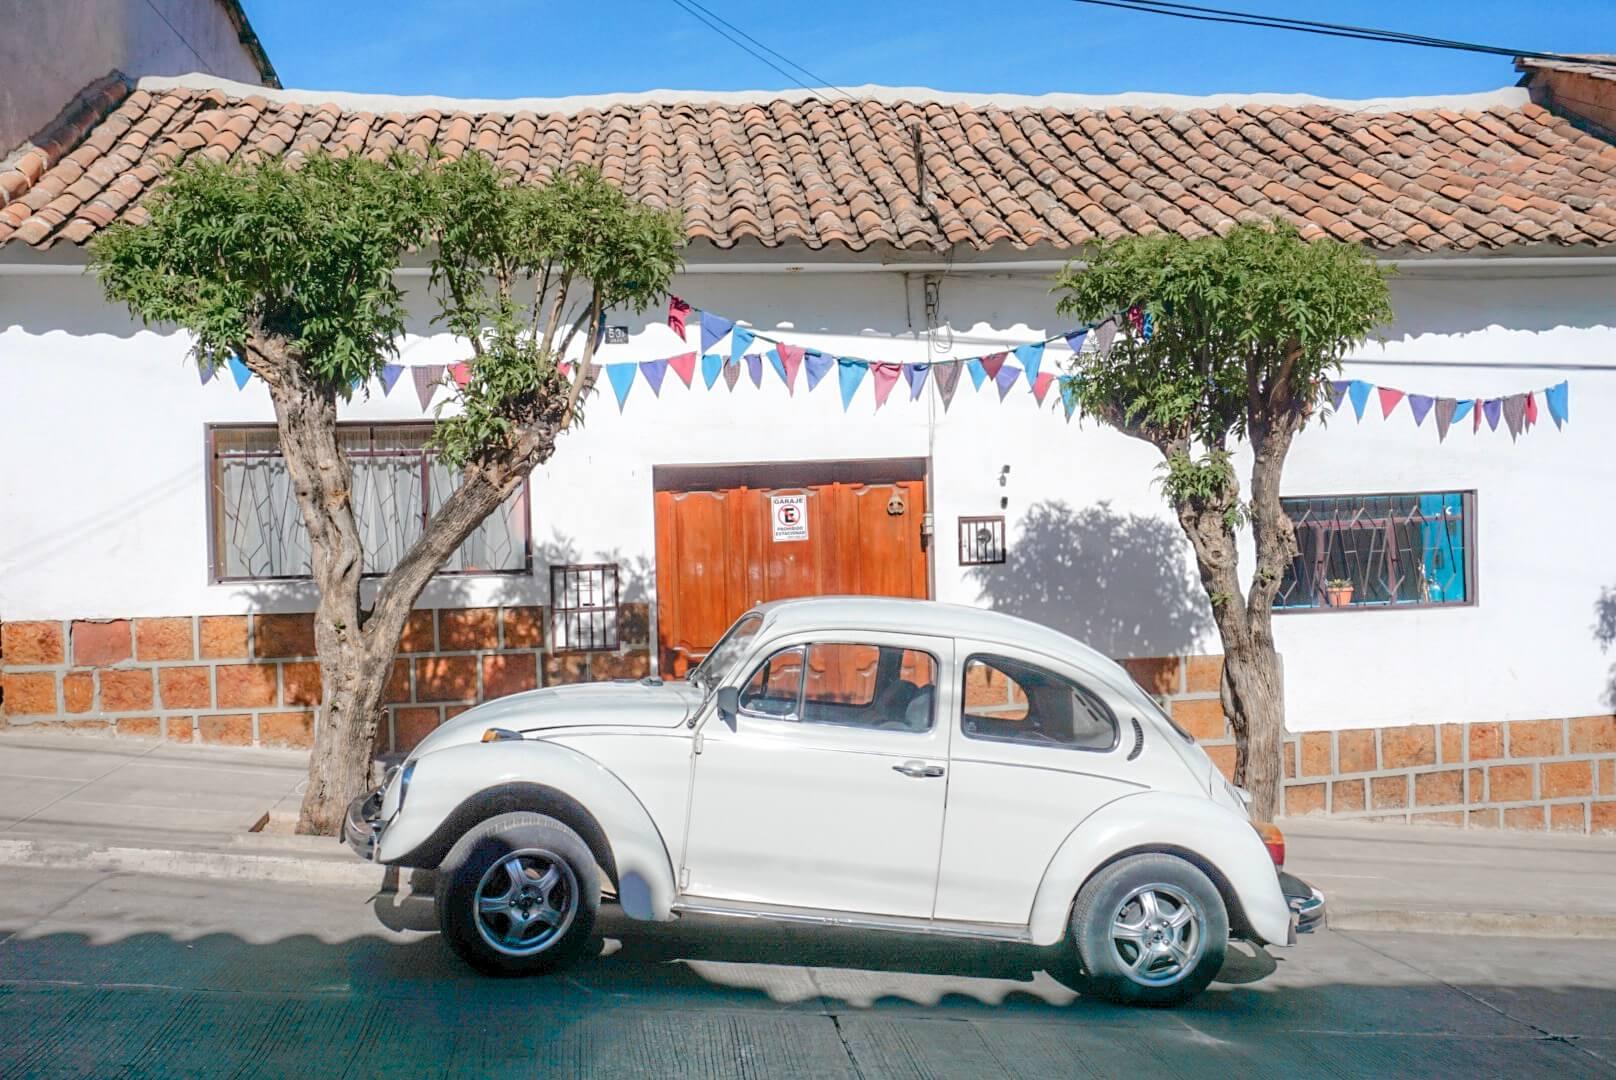 les rues de sucre bolivie blog